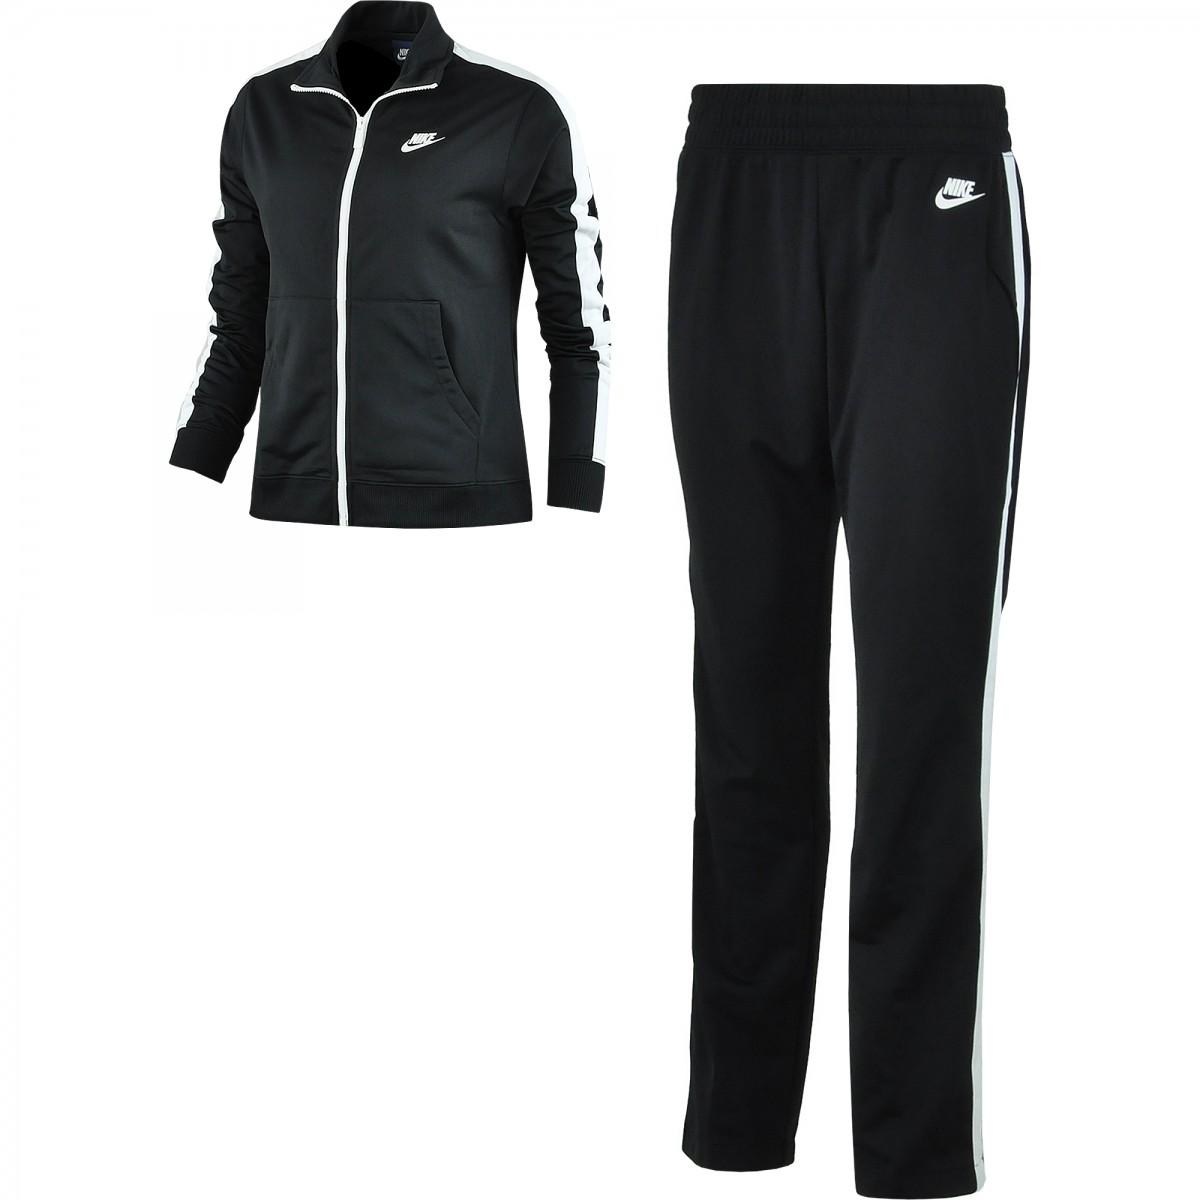 Agasalho Feminino Nike Nsw Track Suit Pk Oh 830345-010 Preto 44548610be703